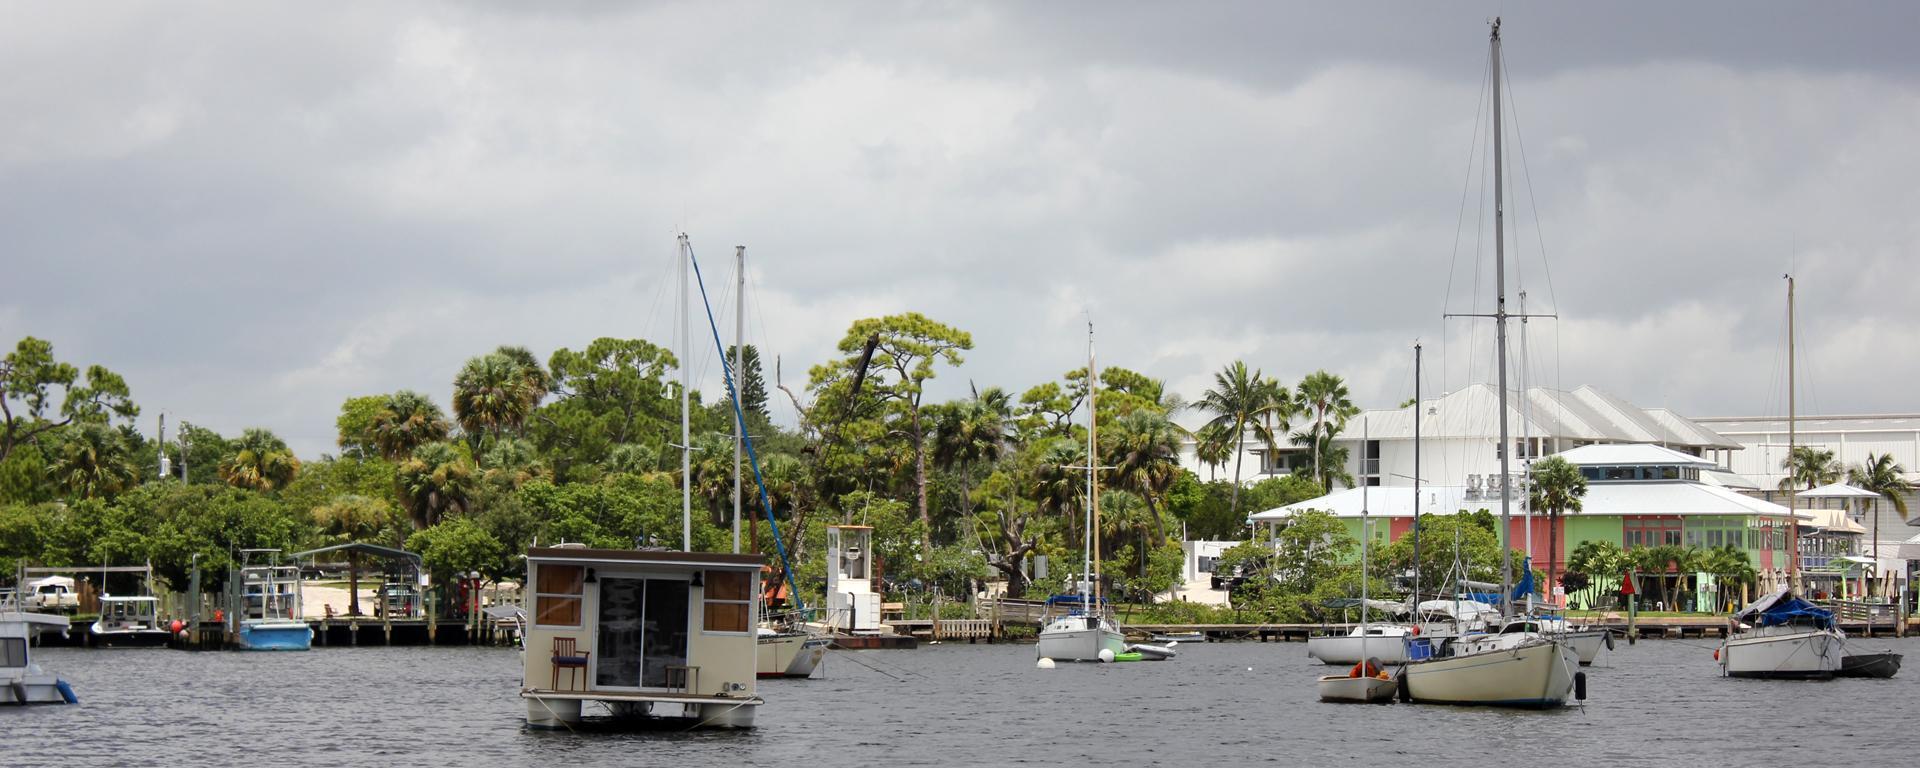 Boats anchored in the Manatee Pocket